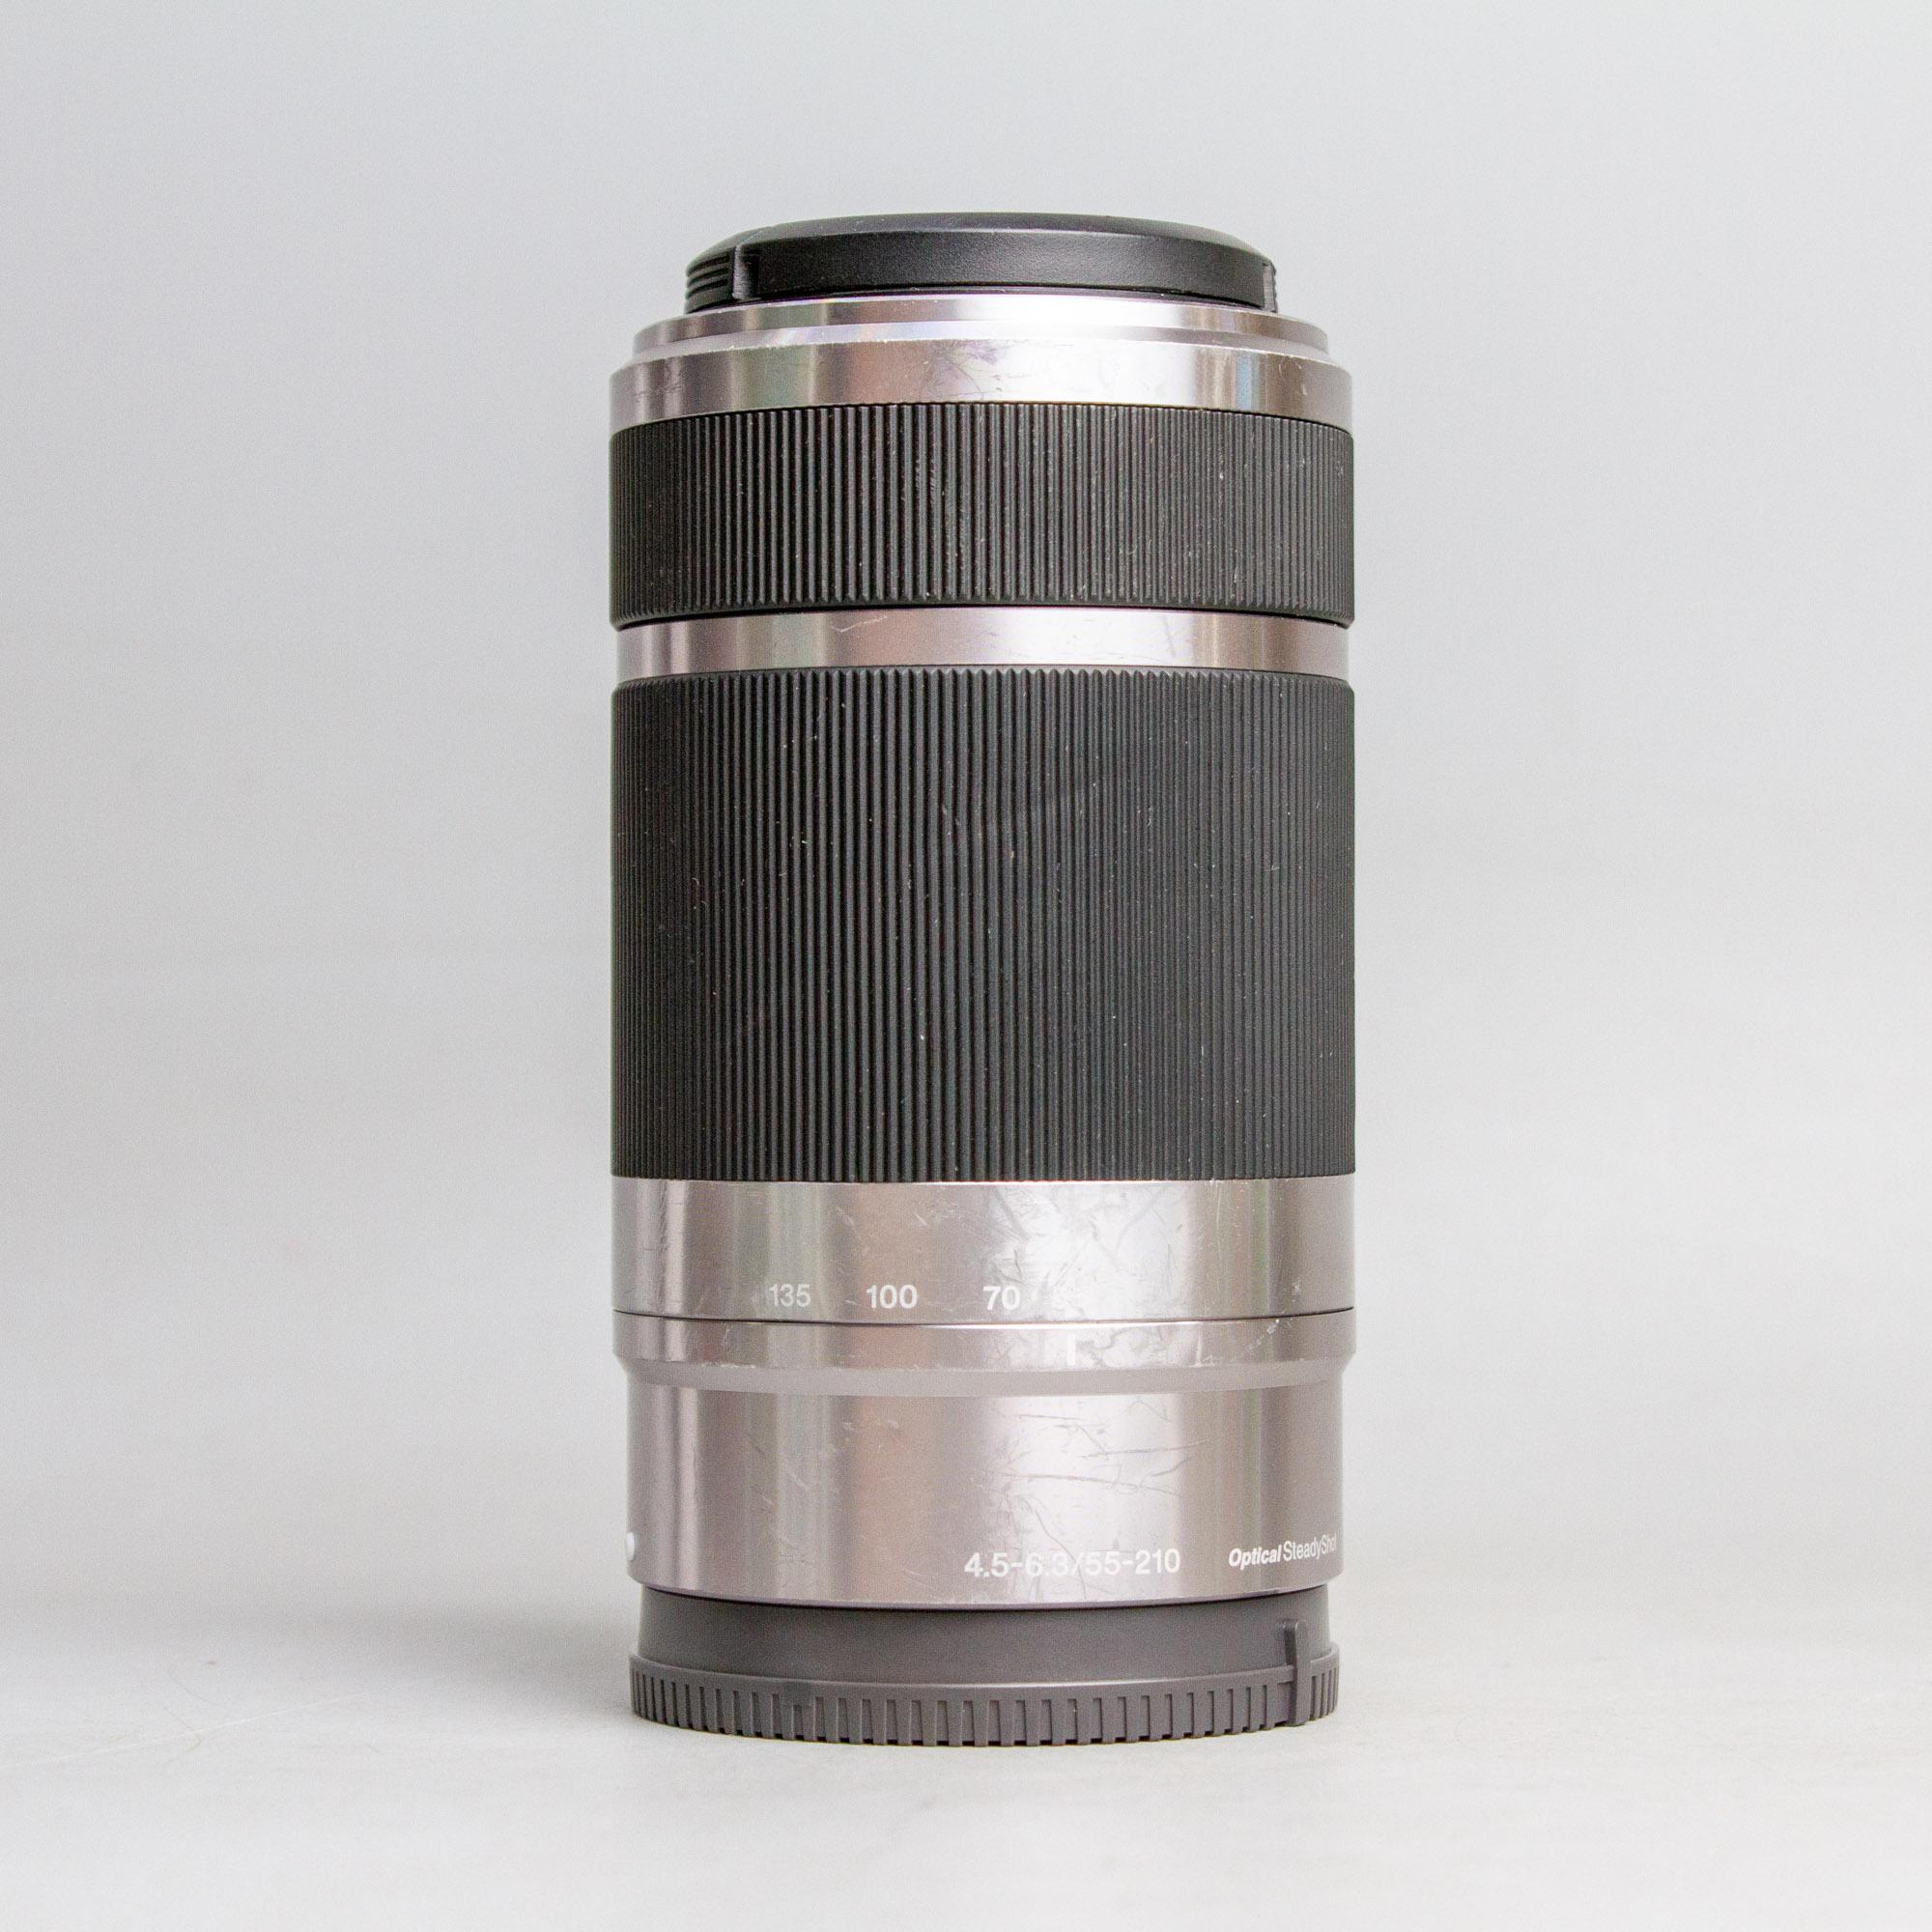 sony-55-210mm-f4-5-6-3-sel-af-oss-55-210-18759